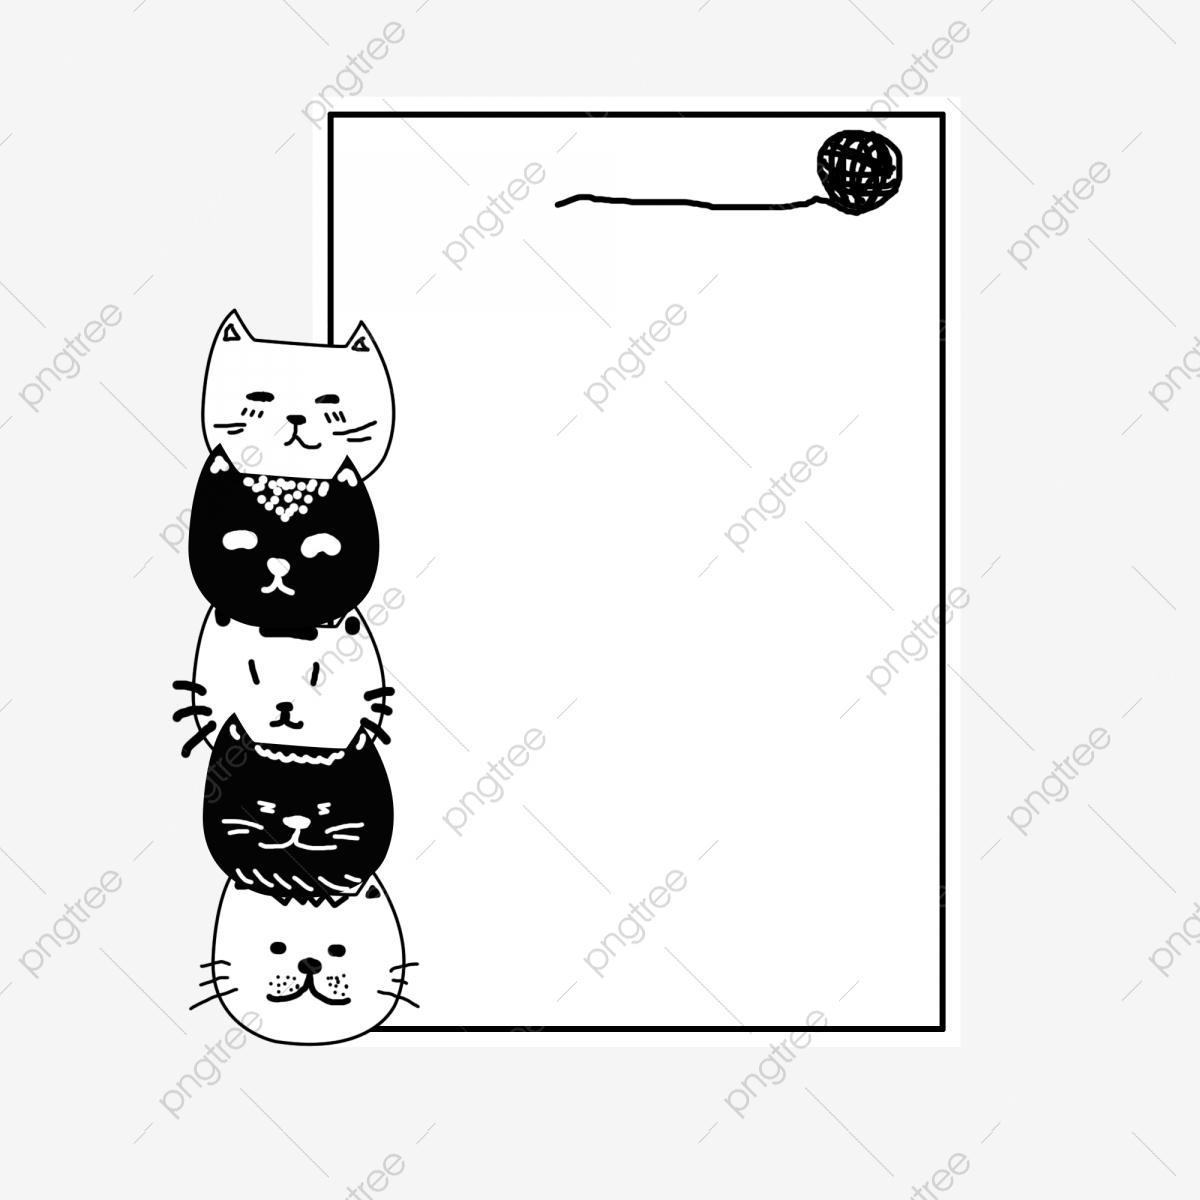 Creative Border Black Line Border Hemp Group Cat Border, Animal.